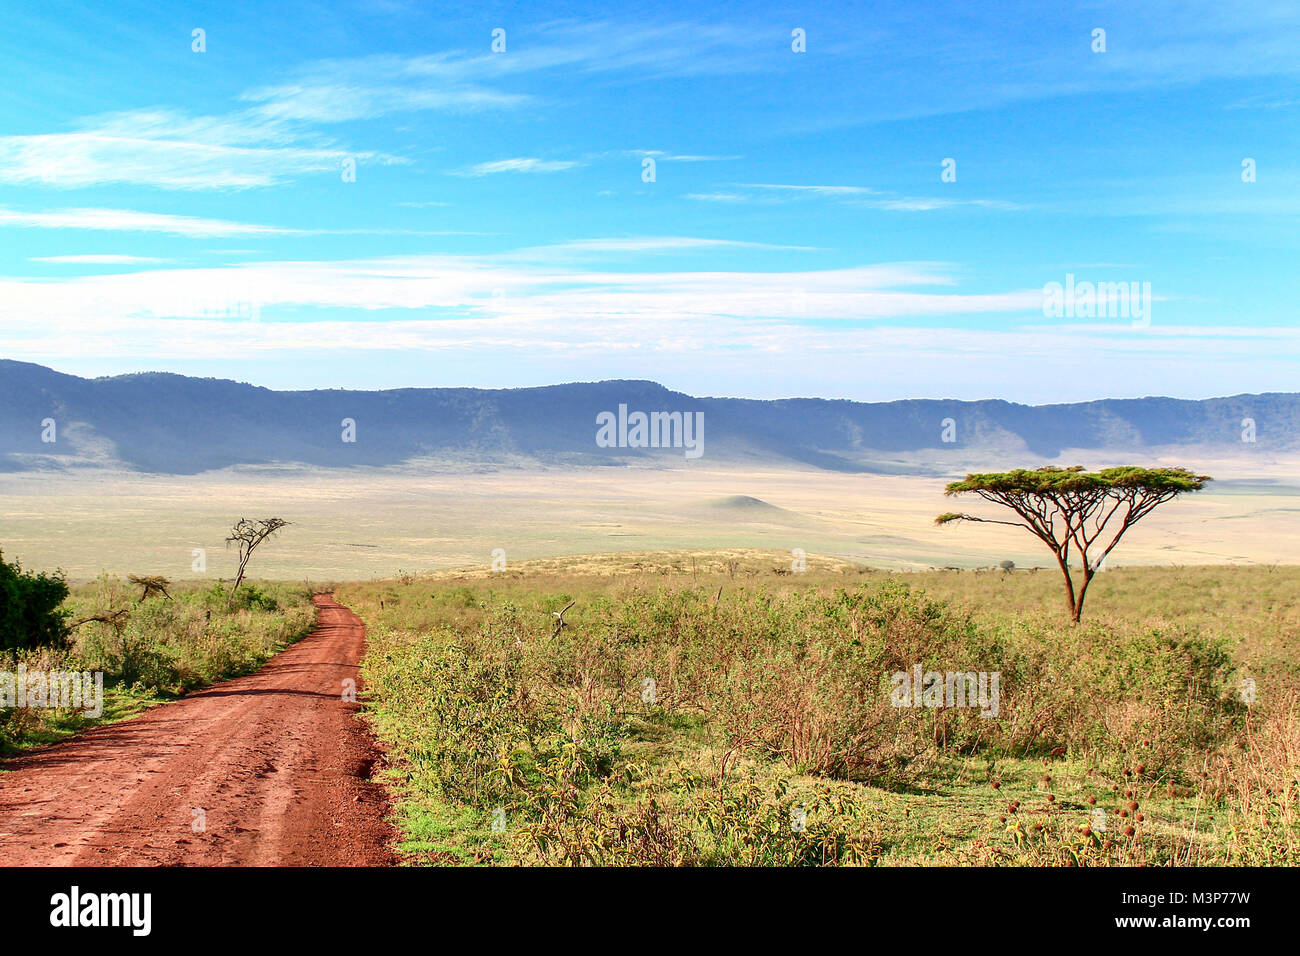 Dirt road  leading to Ngorongoro Crater, Tanzania - Stock Image